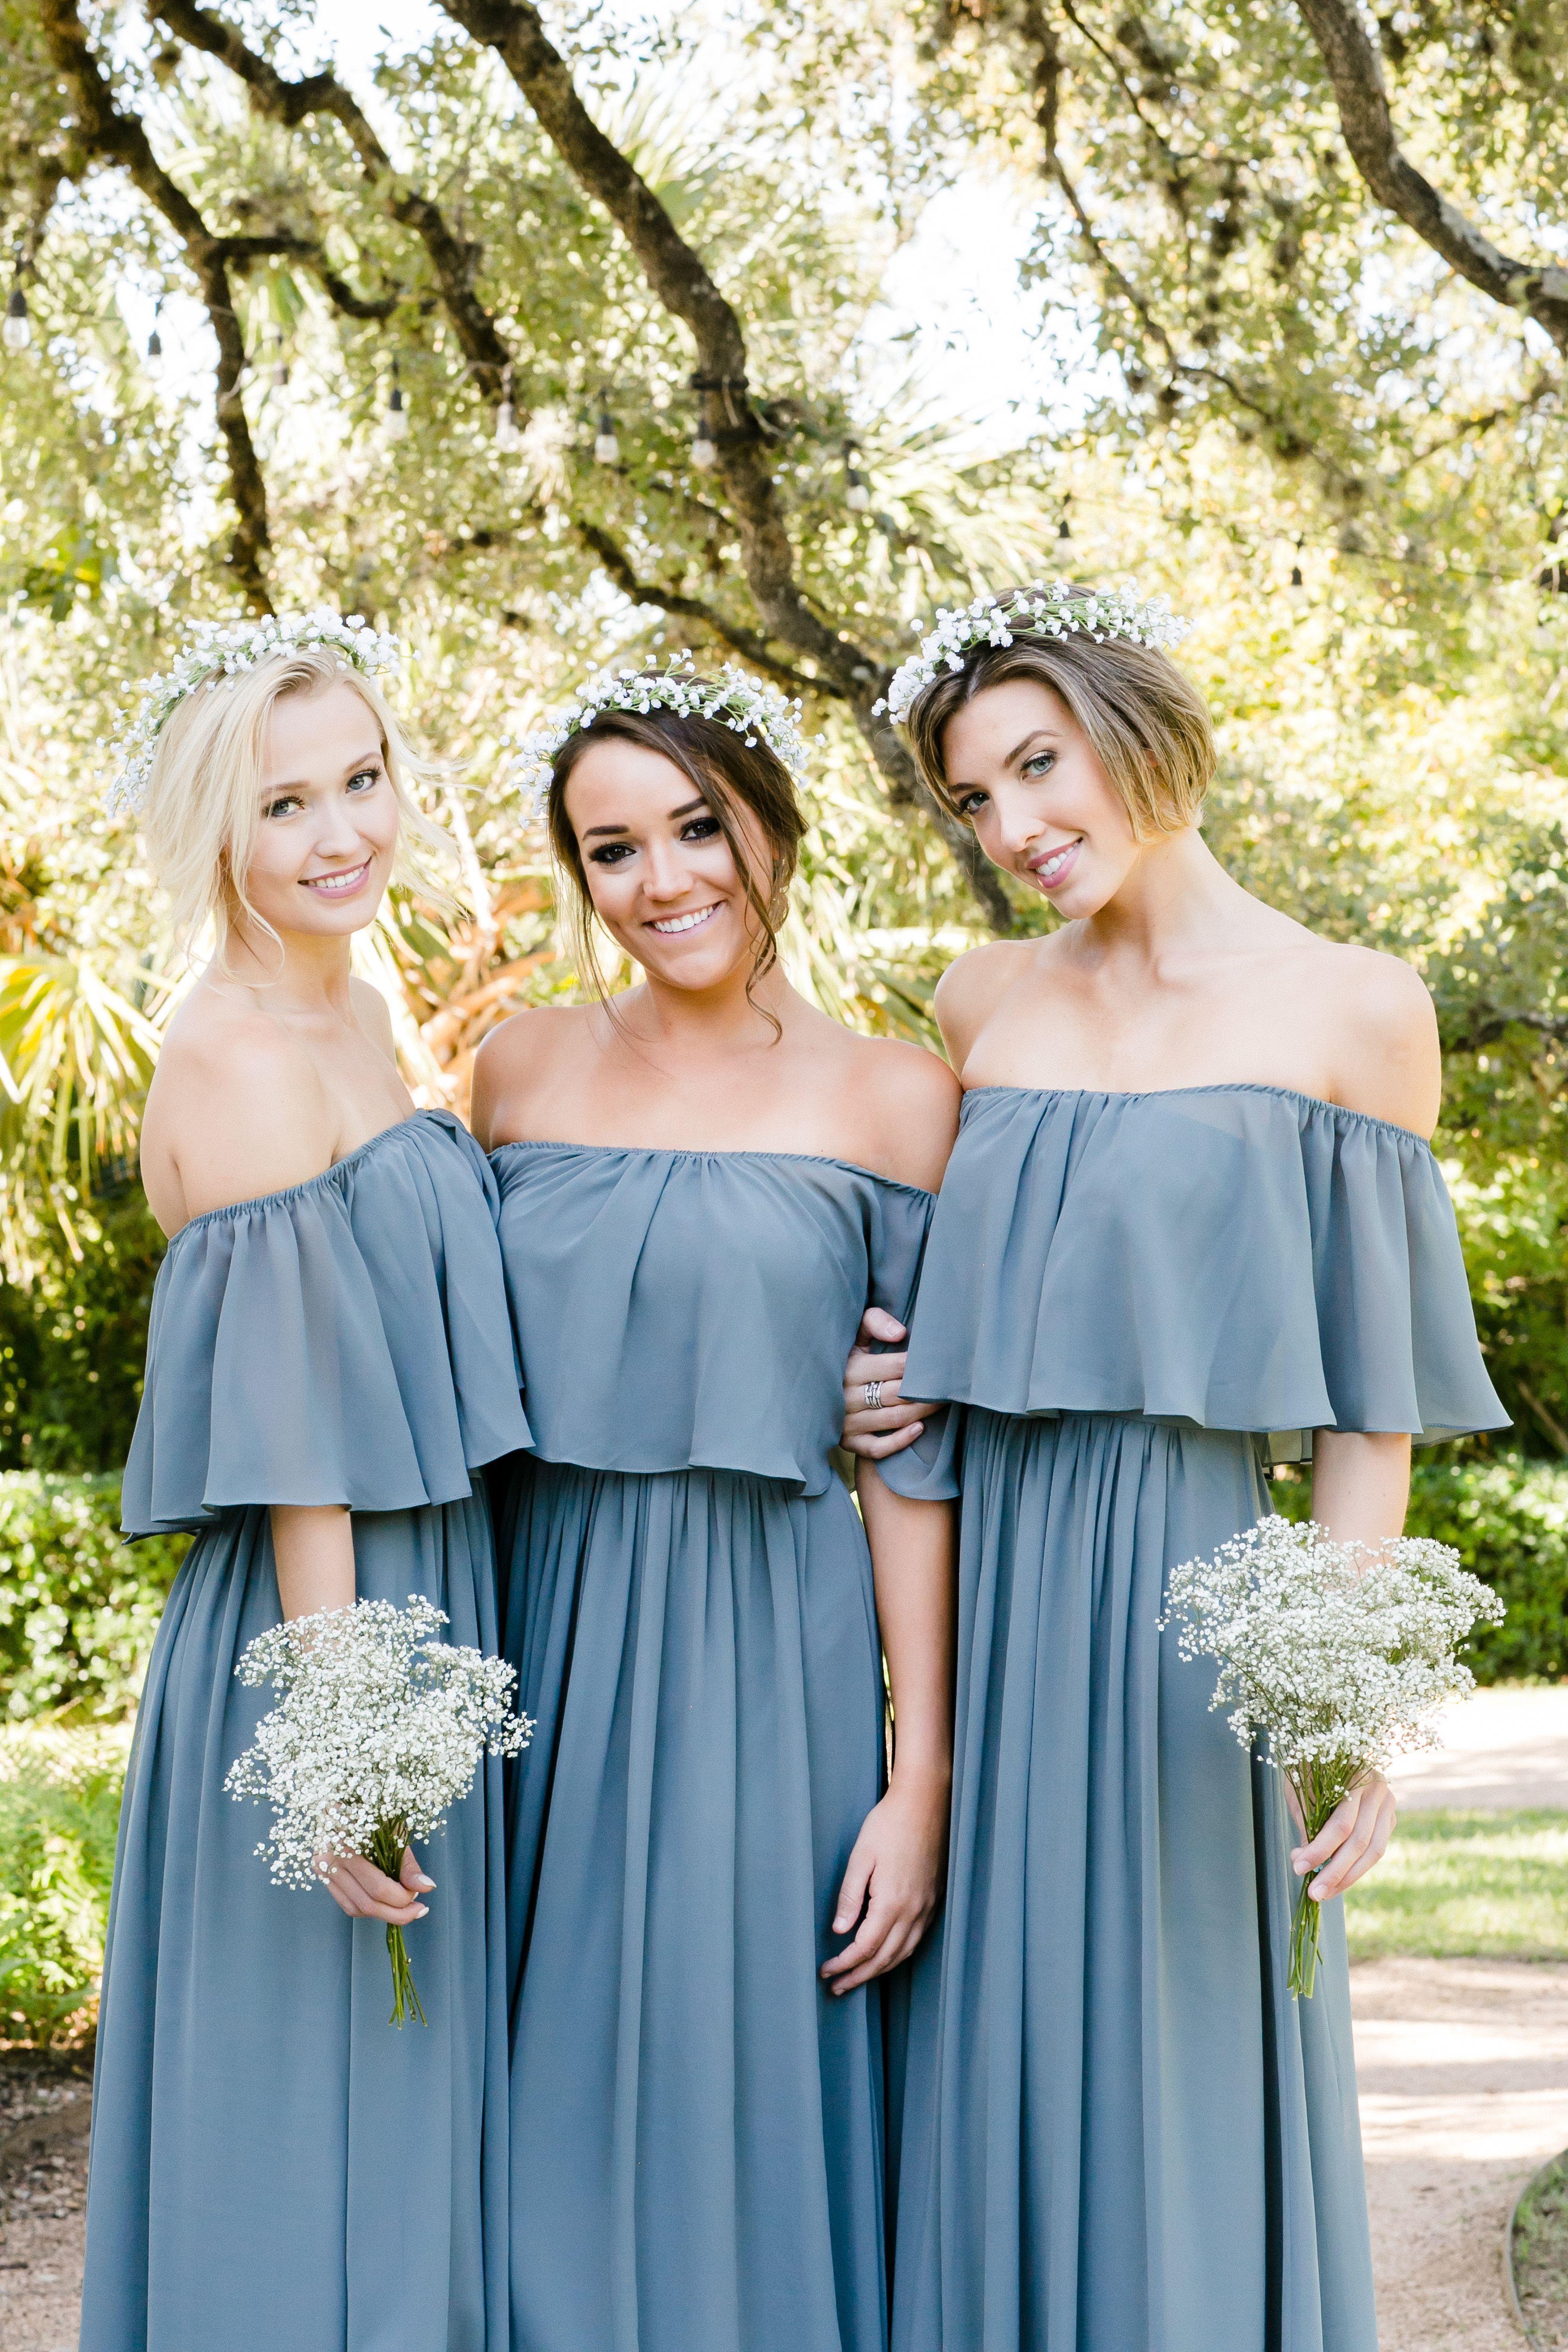 Dusty blue wedding dress  Boho off the shoulder bridesmaid dress Abigail from Revelry looks